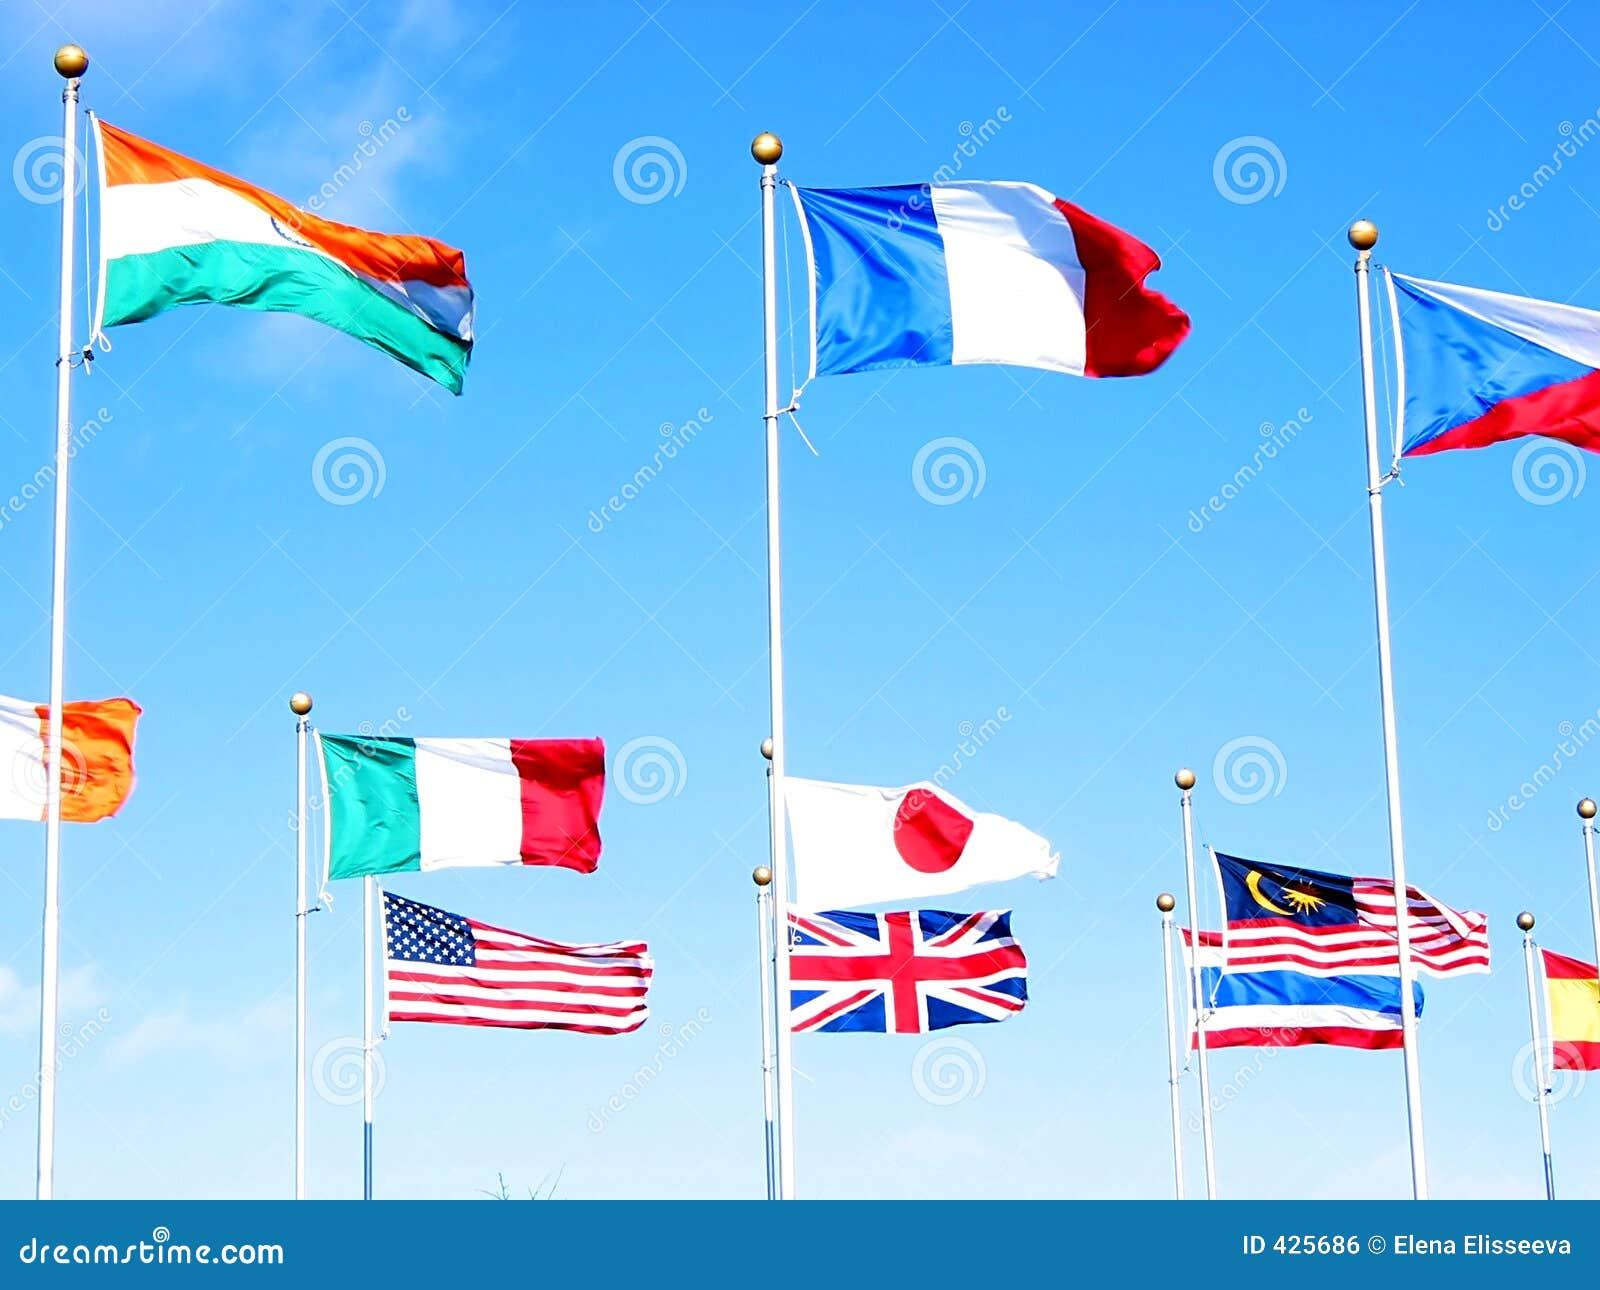 International business 3 international business for Cci chambre de commerce internationale